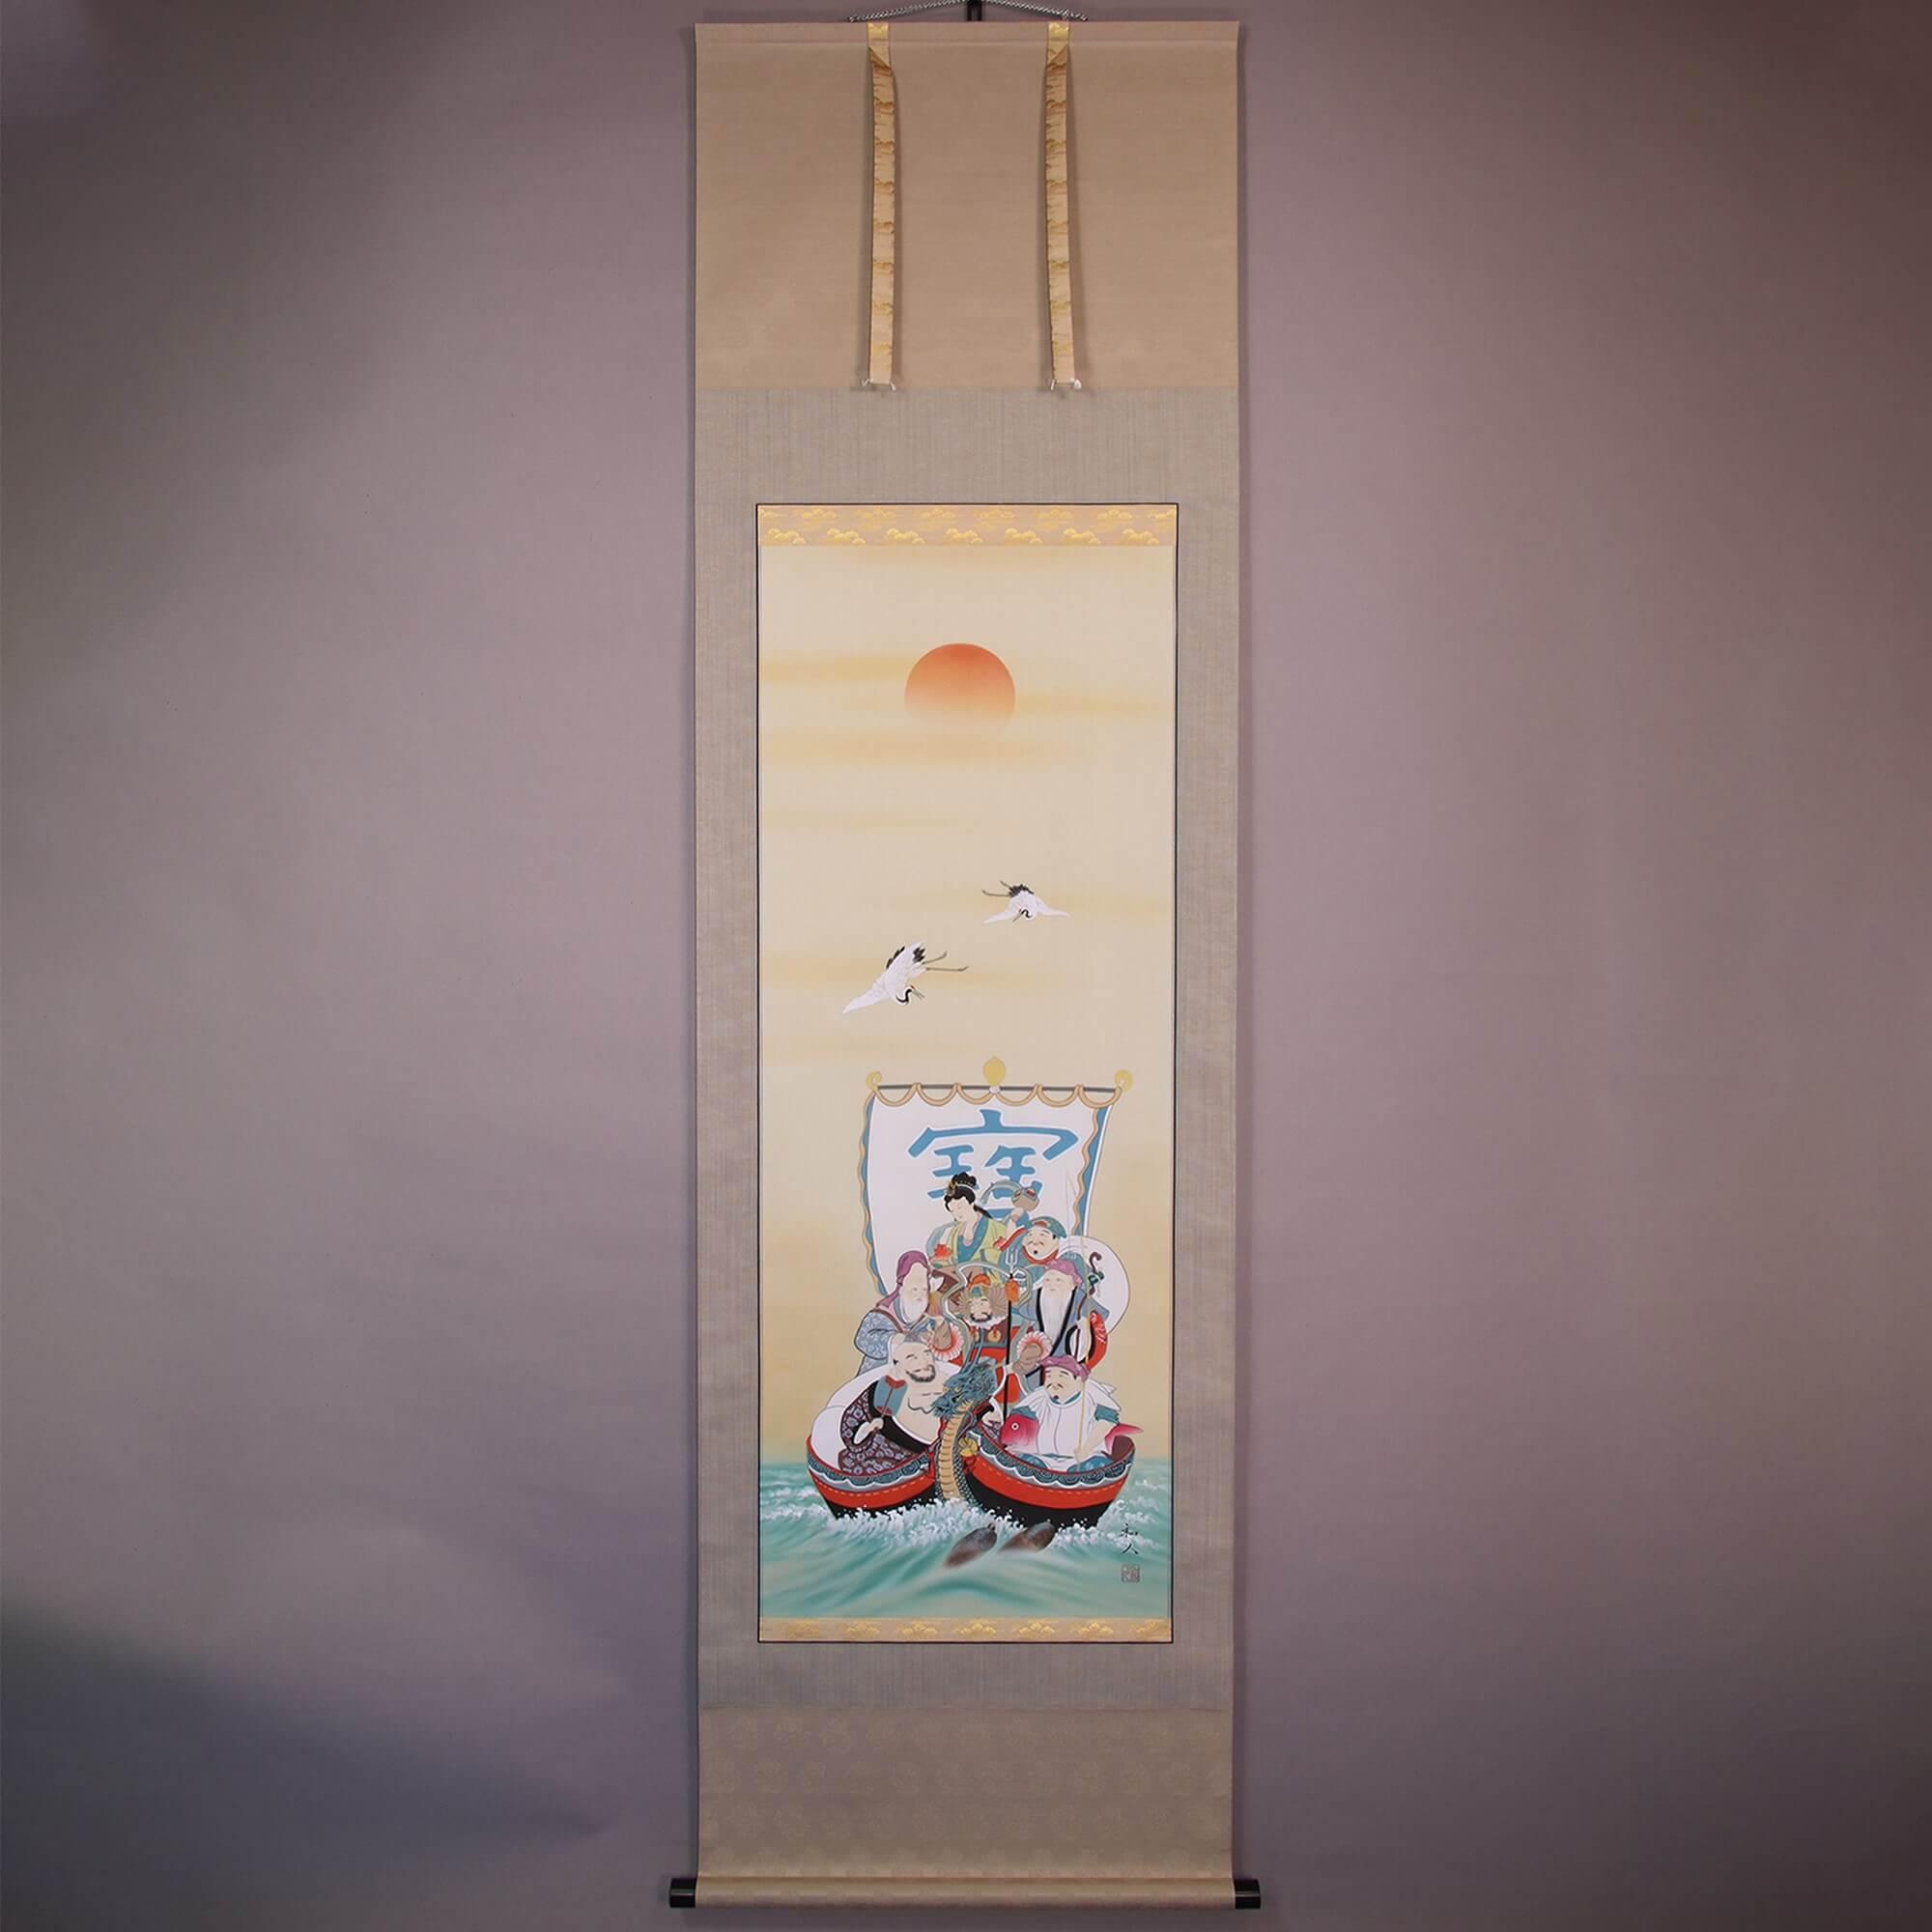 Treasure Ship (Seven Lucky Gods) / Nishida Kazuto